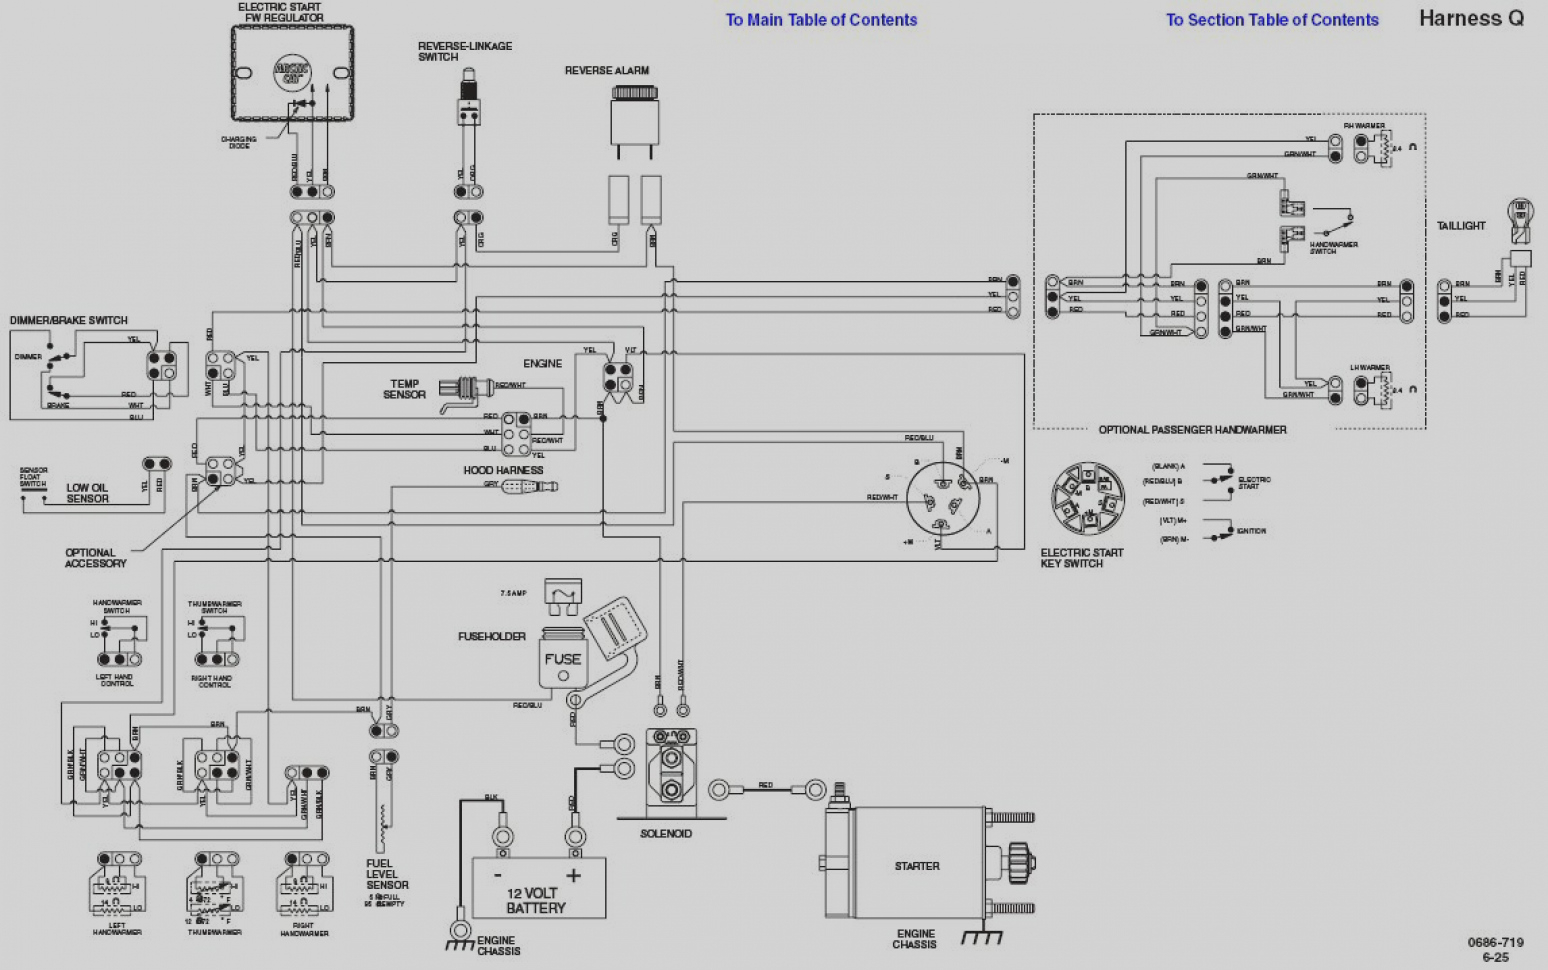 rupp snowmobile wiring diagram wiring diagrams lol Vintage Snowmobile Ignition rupp snowmobile wiring diagram wiring diagram g8 vintage snowmobile wiring diagram rupp snowmobile wiring diagram